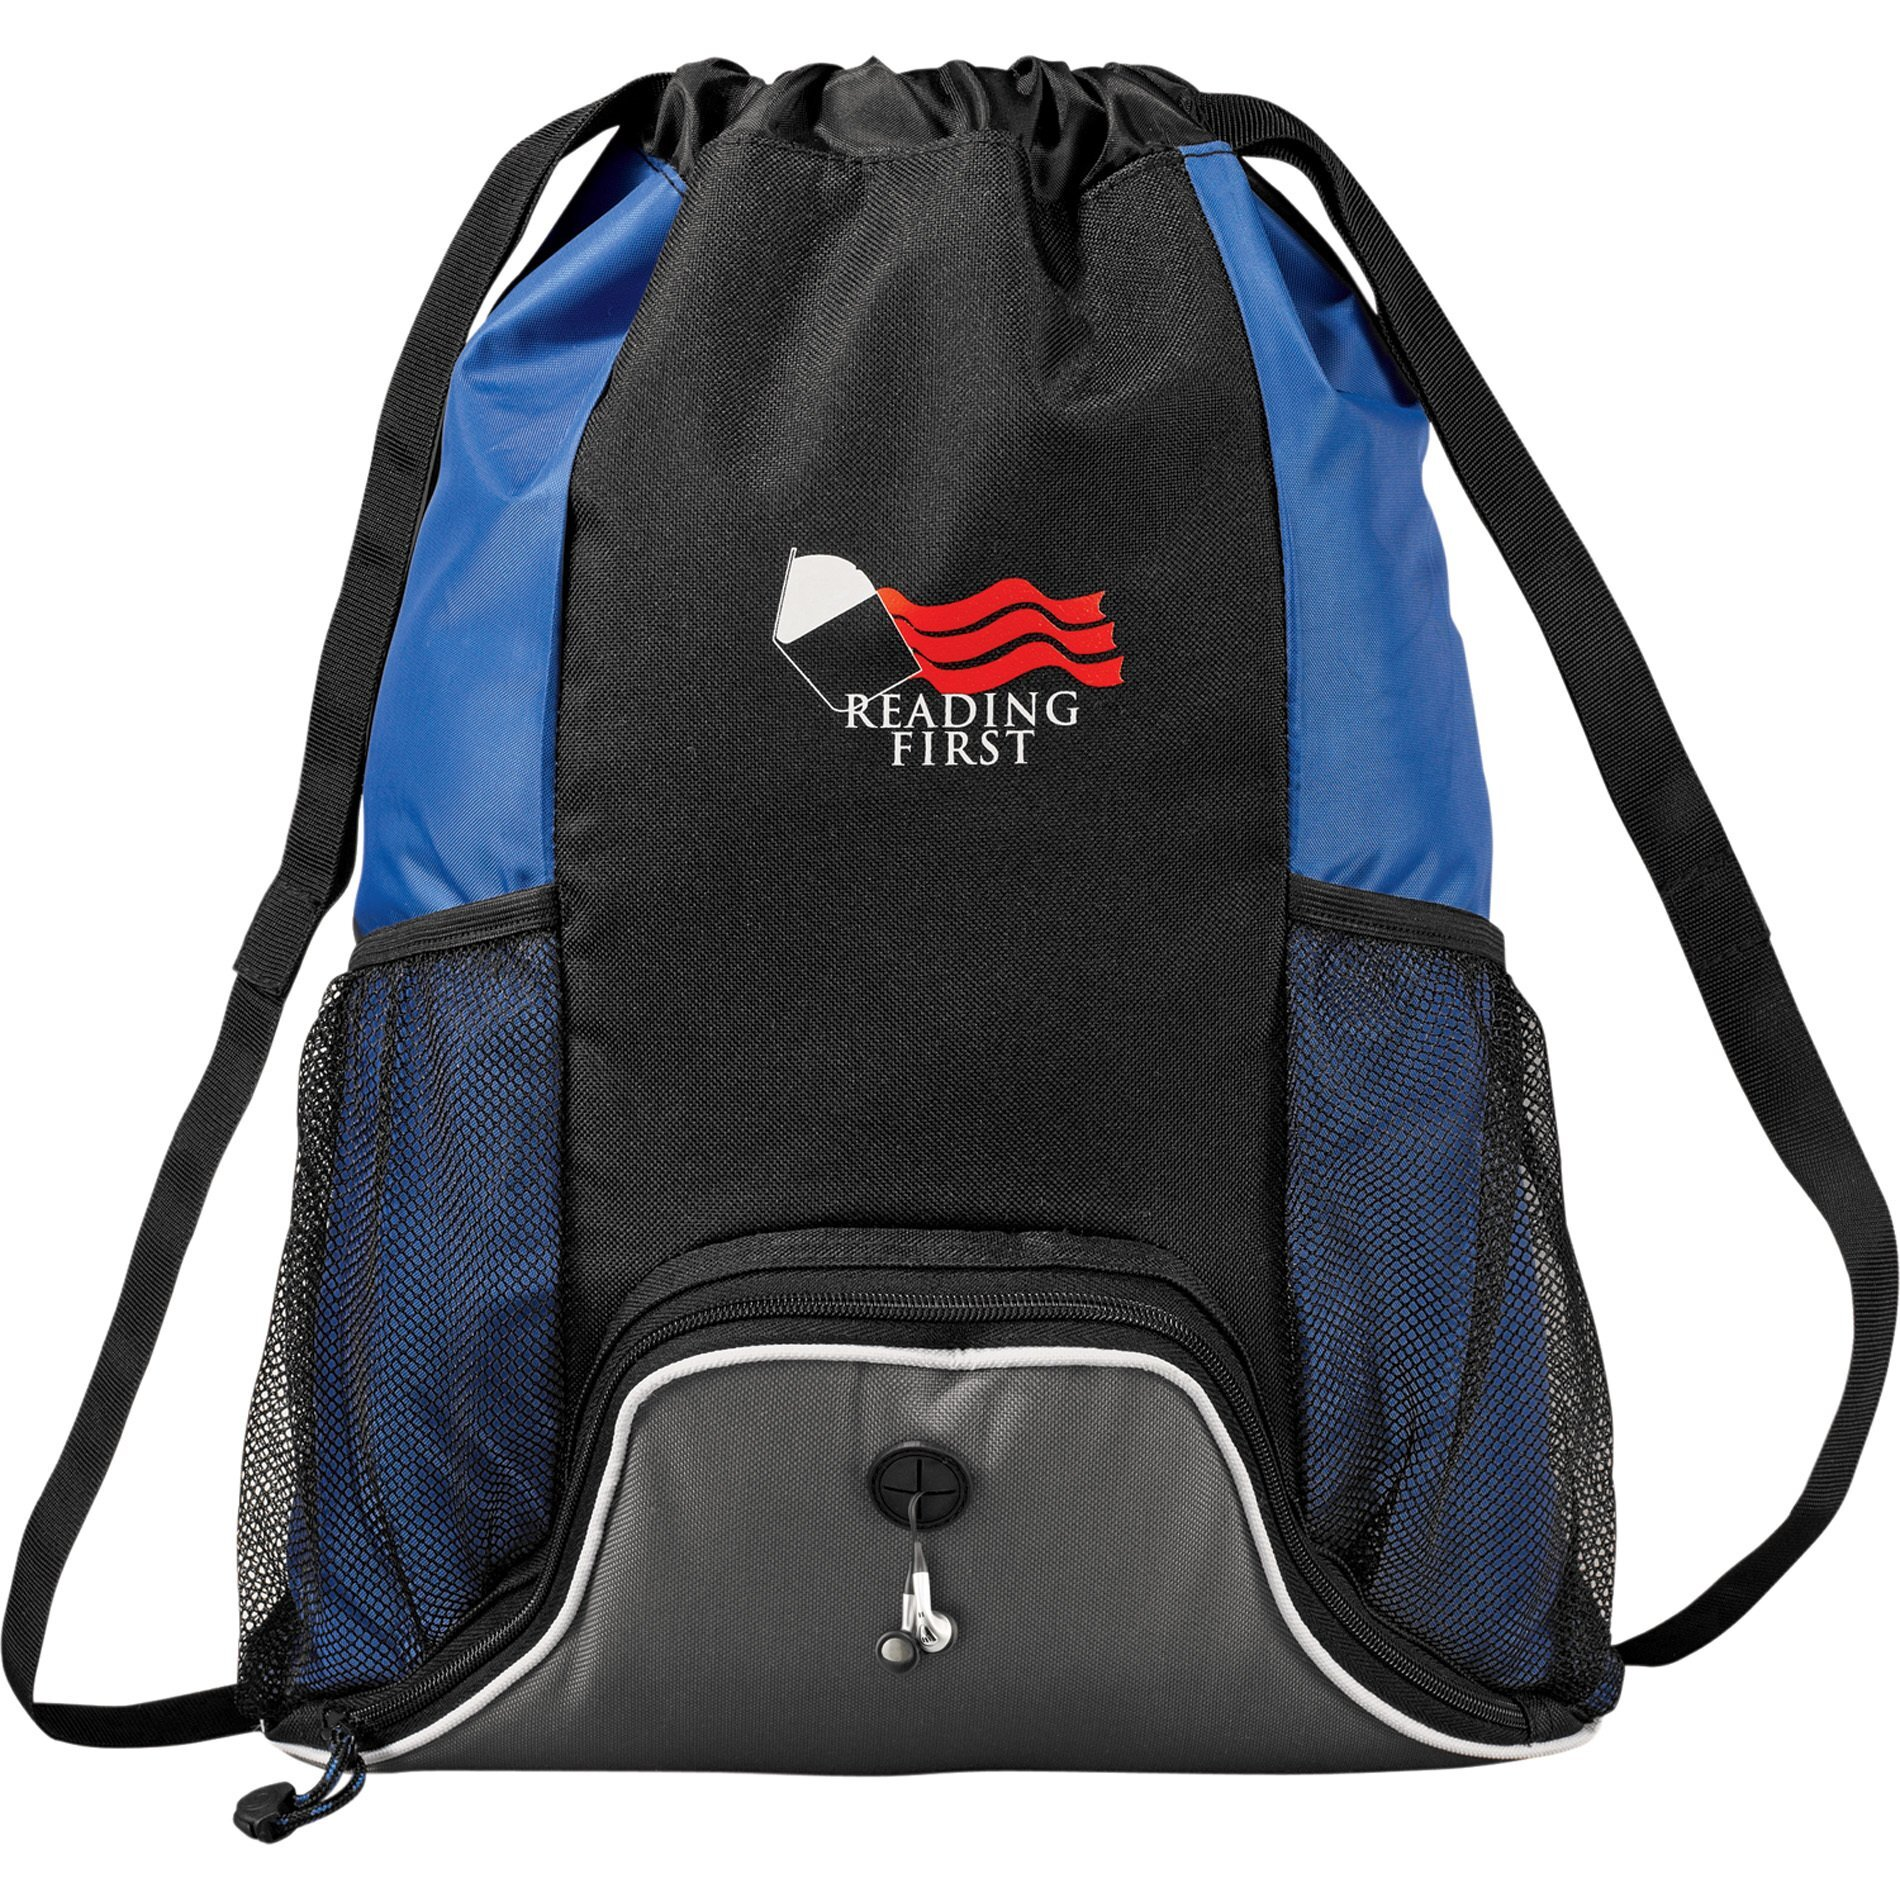 Corona Deluxe Drawstring Nylon Sportspack